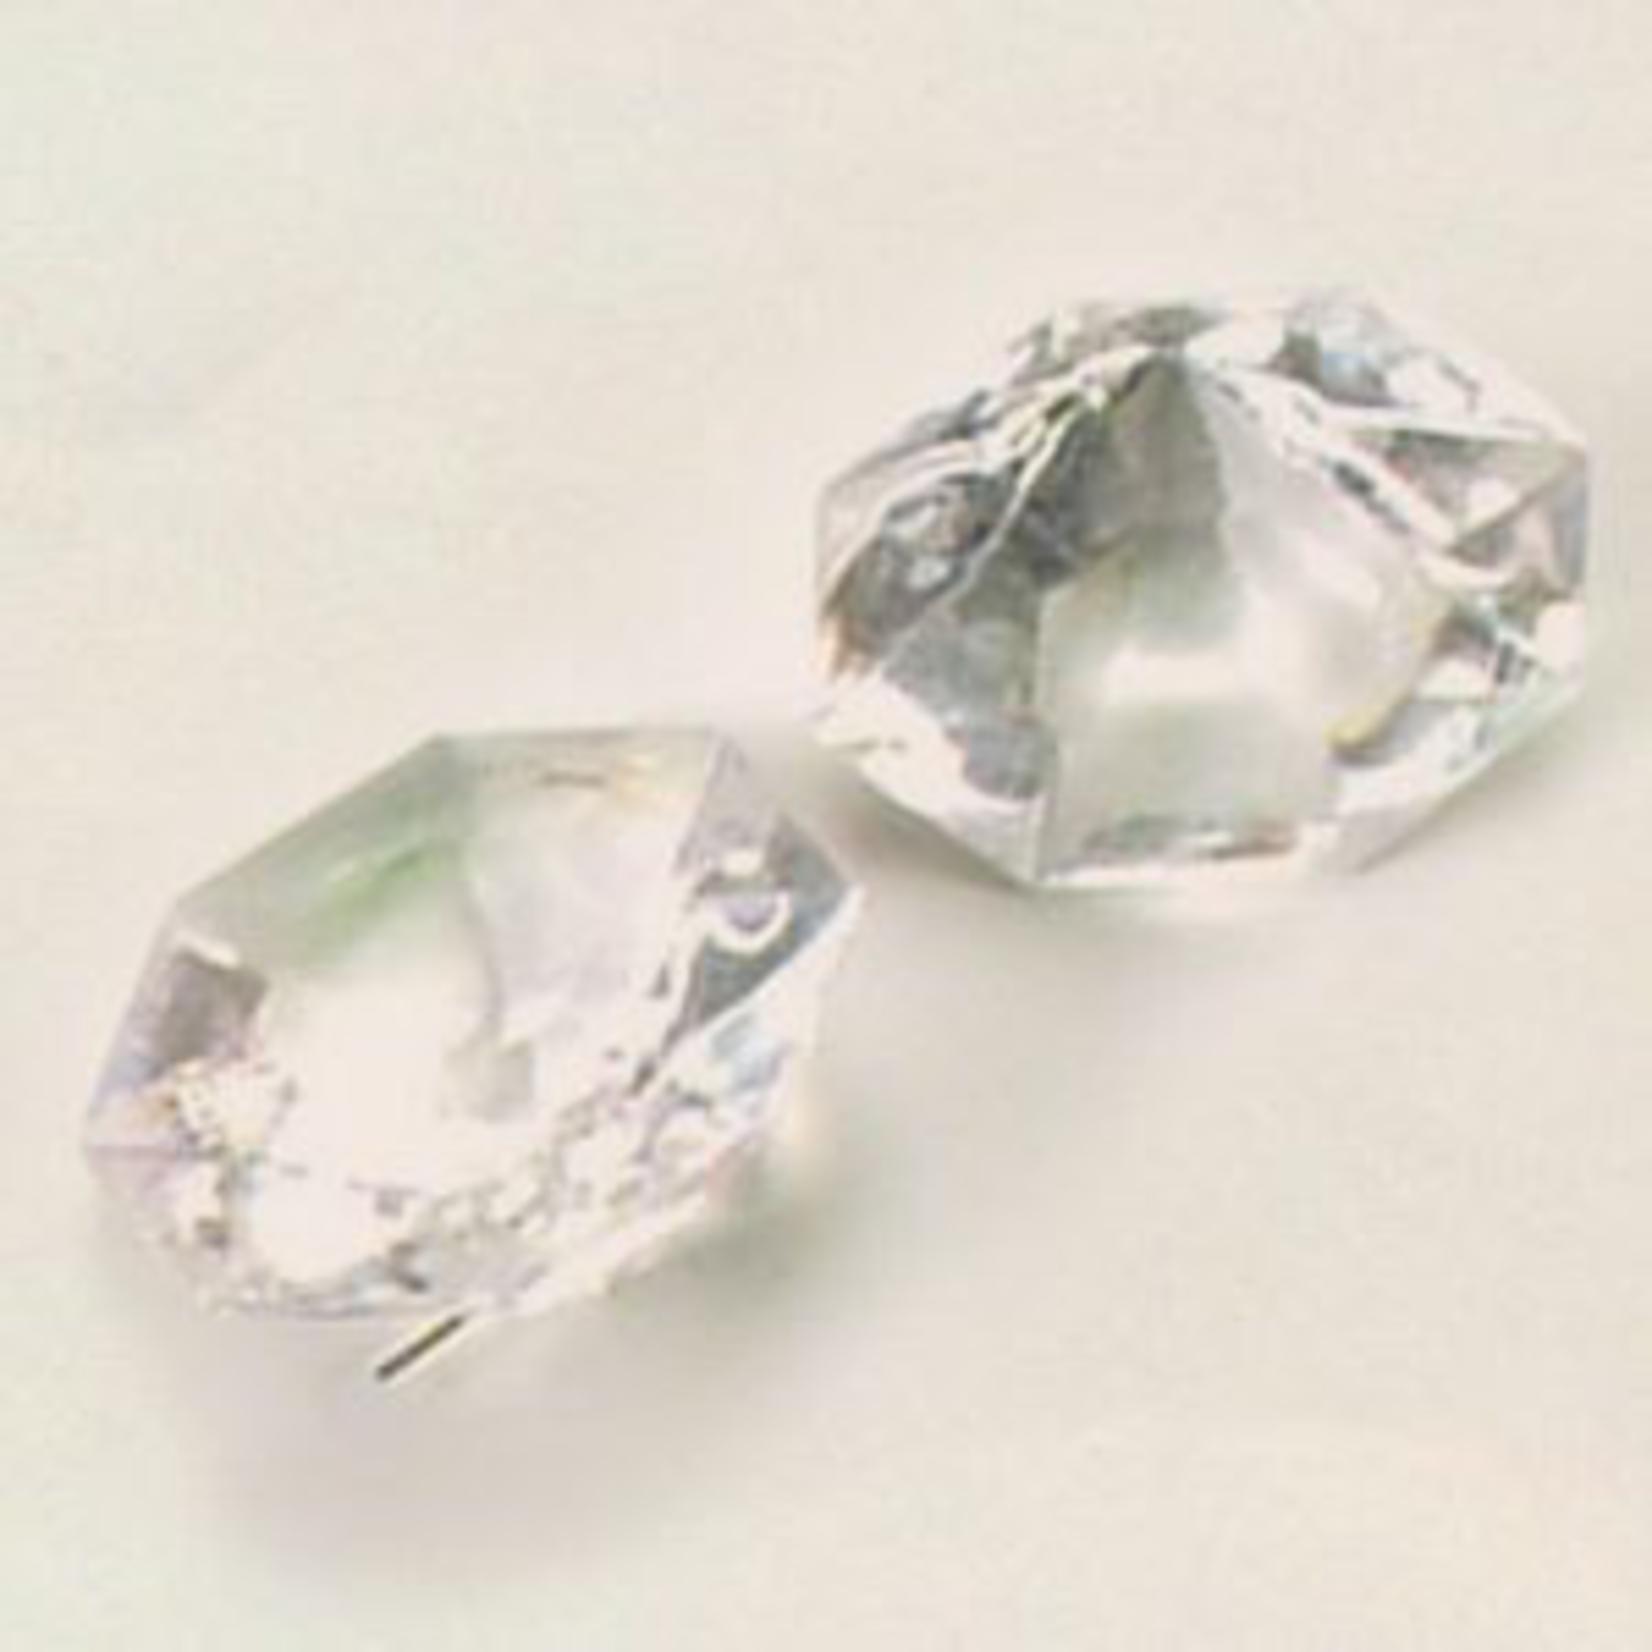 32X32X22MM ACRYLIC DIAMOND, 1 LBS/PACK